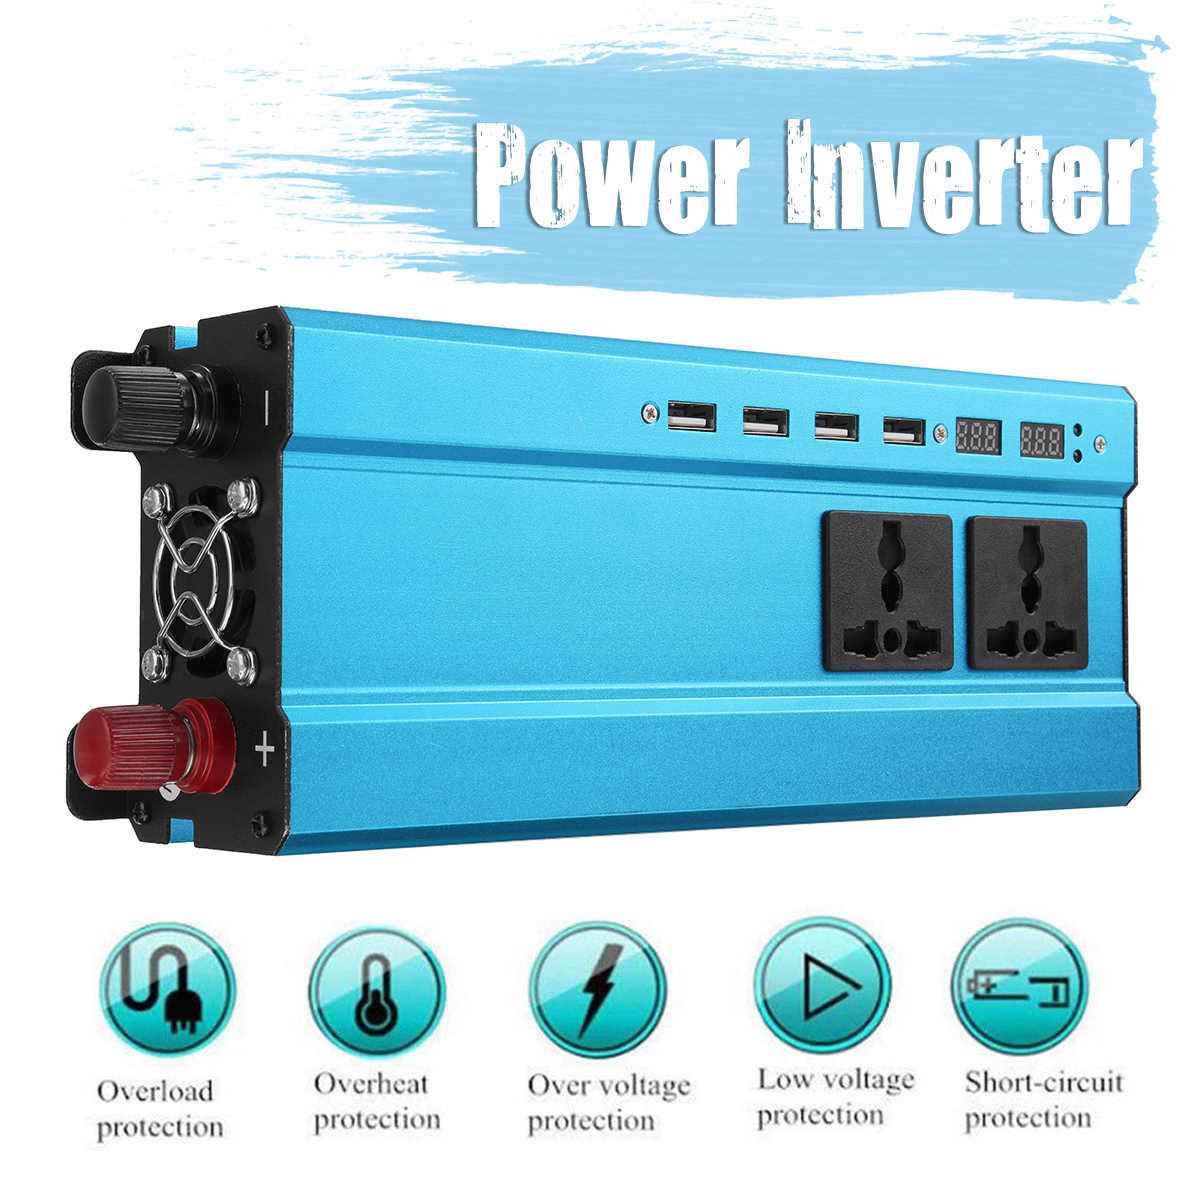 цена на 5000W P eak Power Car Inverter Converter 12V 220V DC-AC Solar Sine Wave Inverter LED Display Transformer For Car Charger 5000W